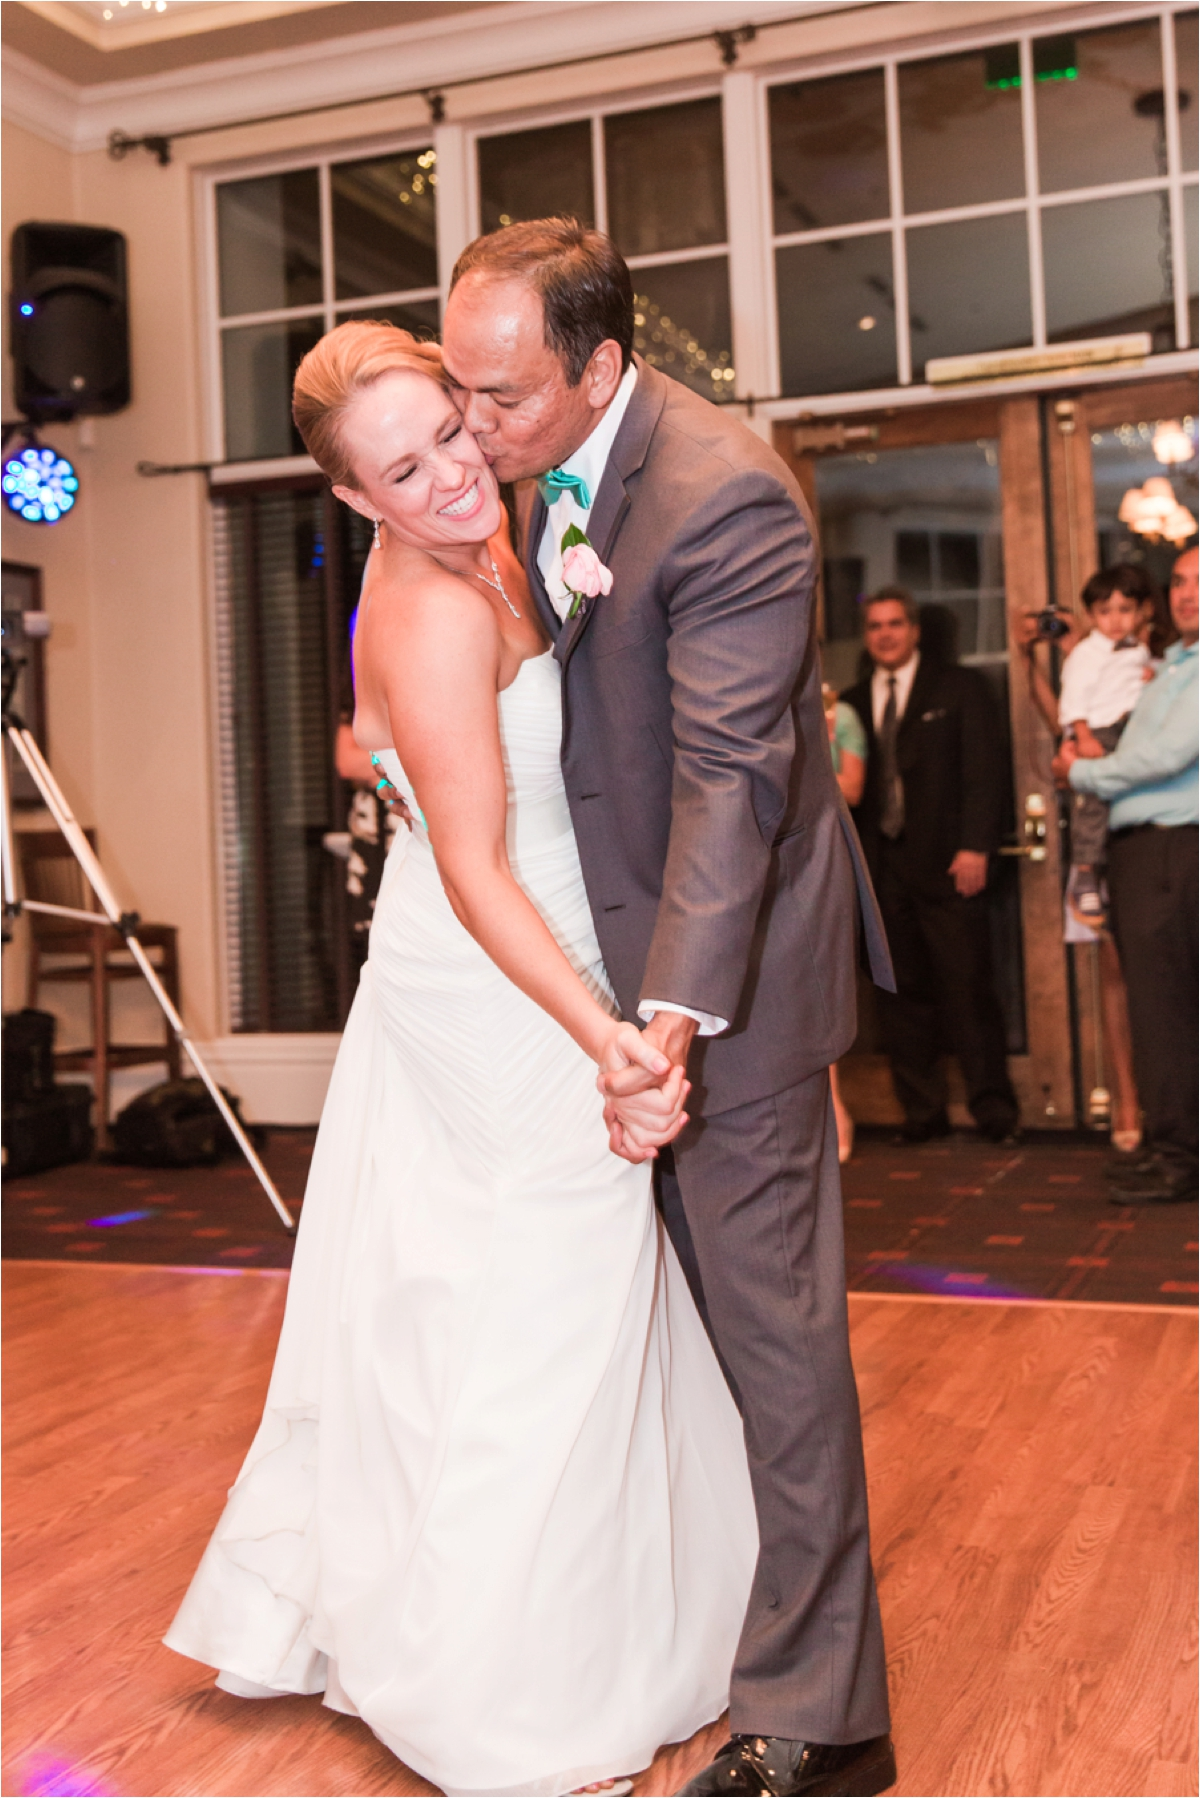 Eagle Ridge Golf Club wedding pictures by Briana Calderon Photography_0452.jpg